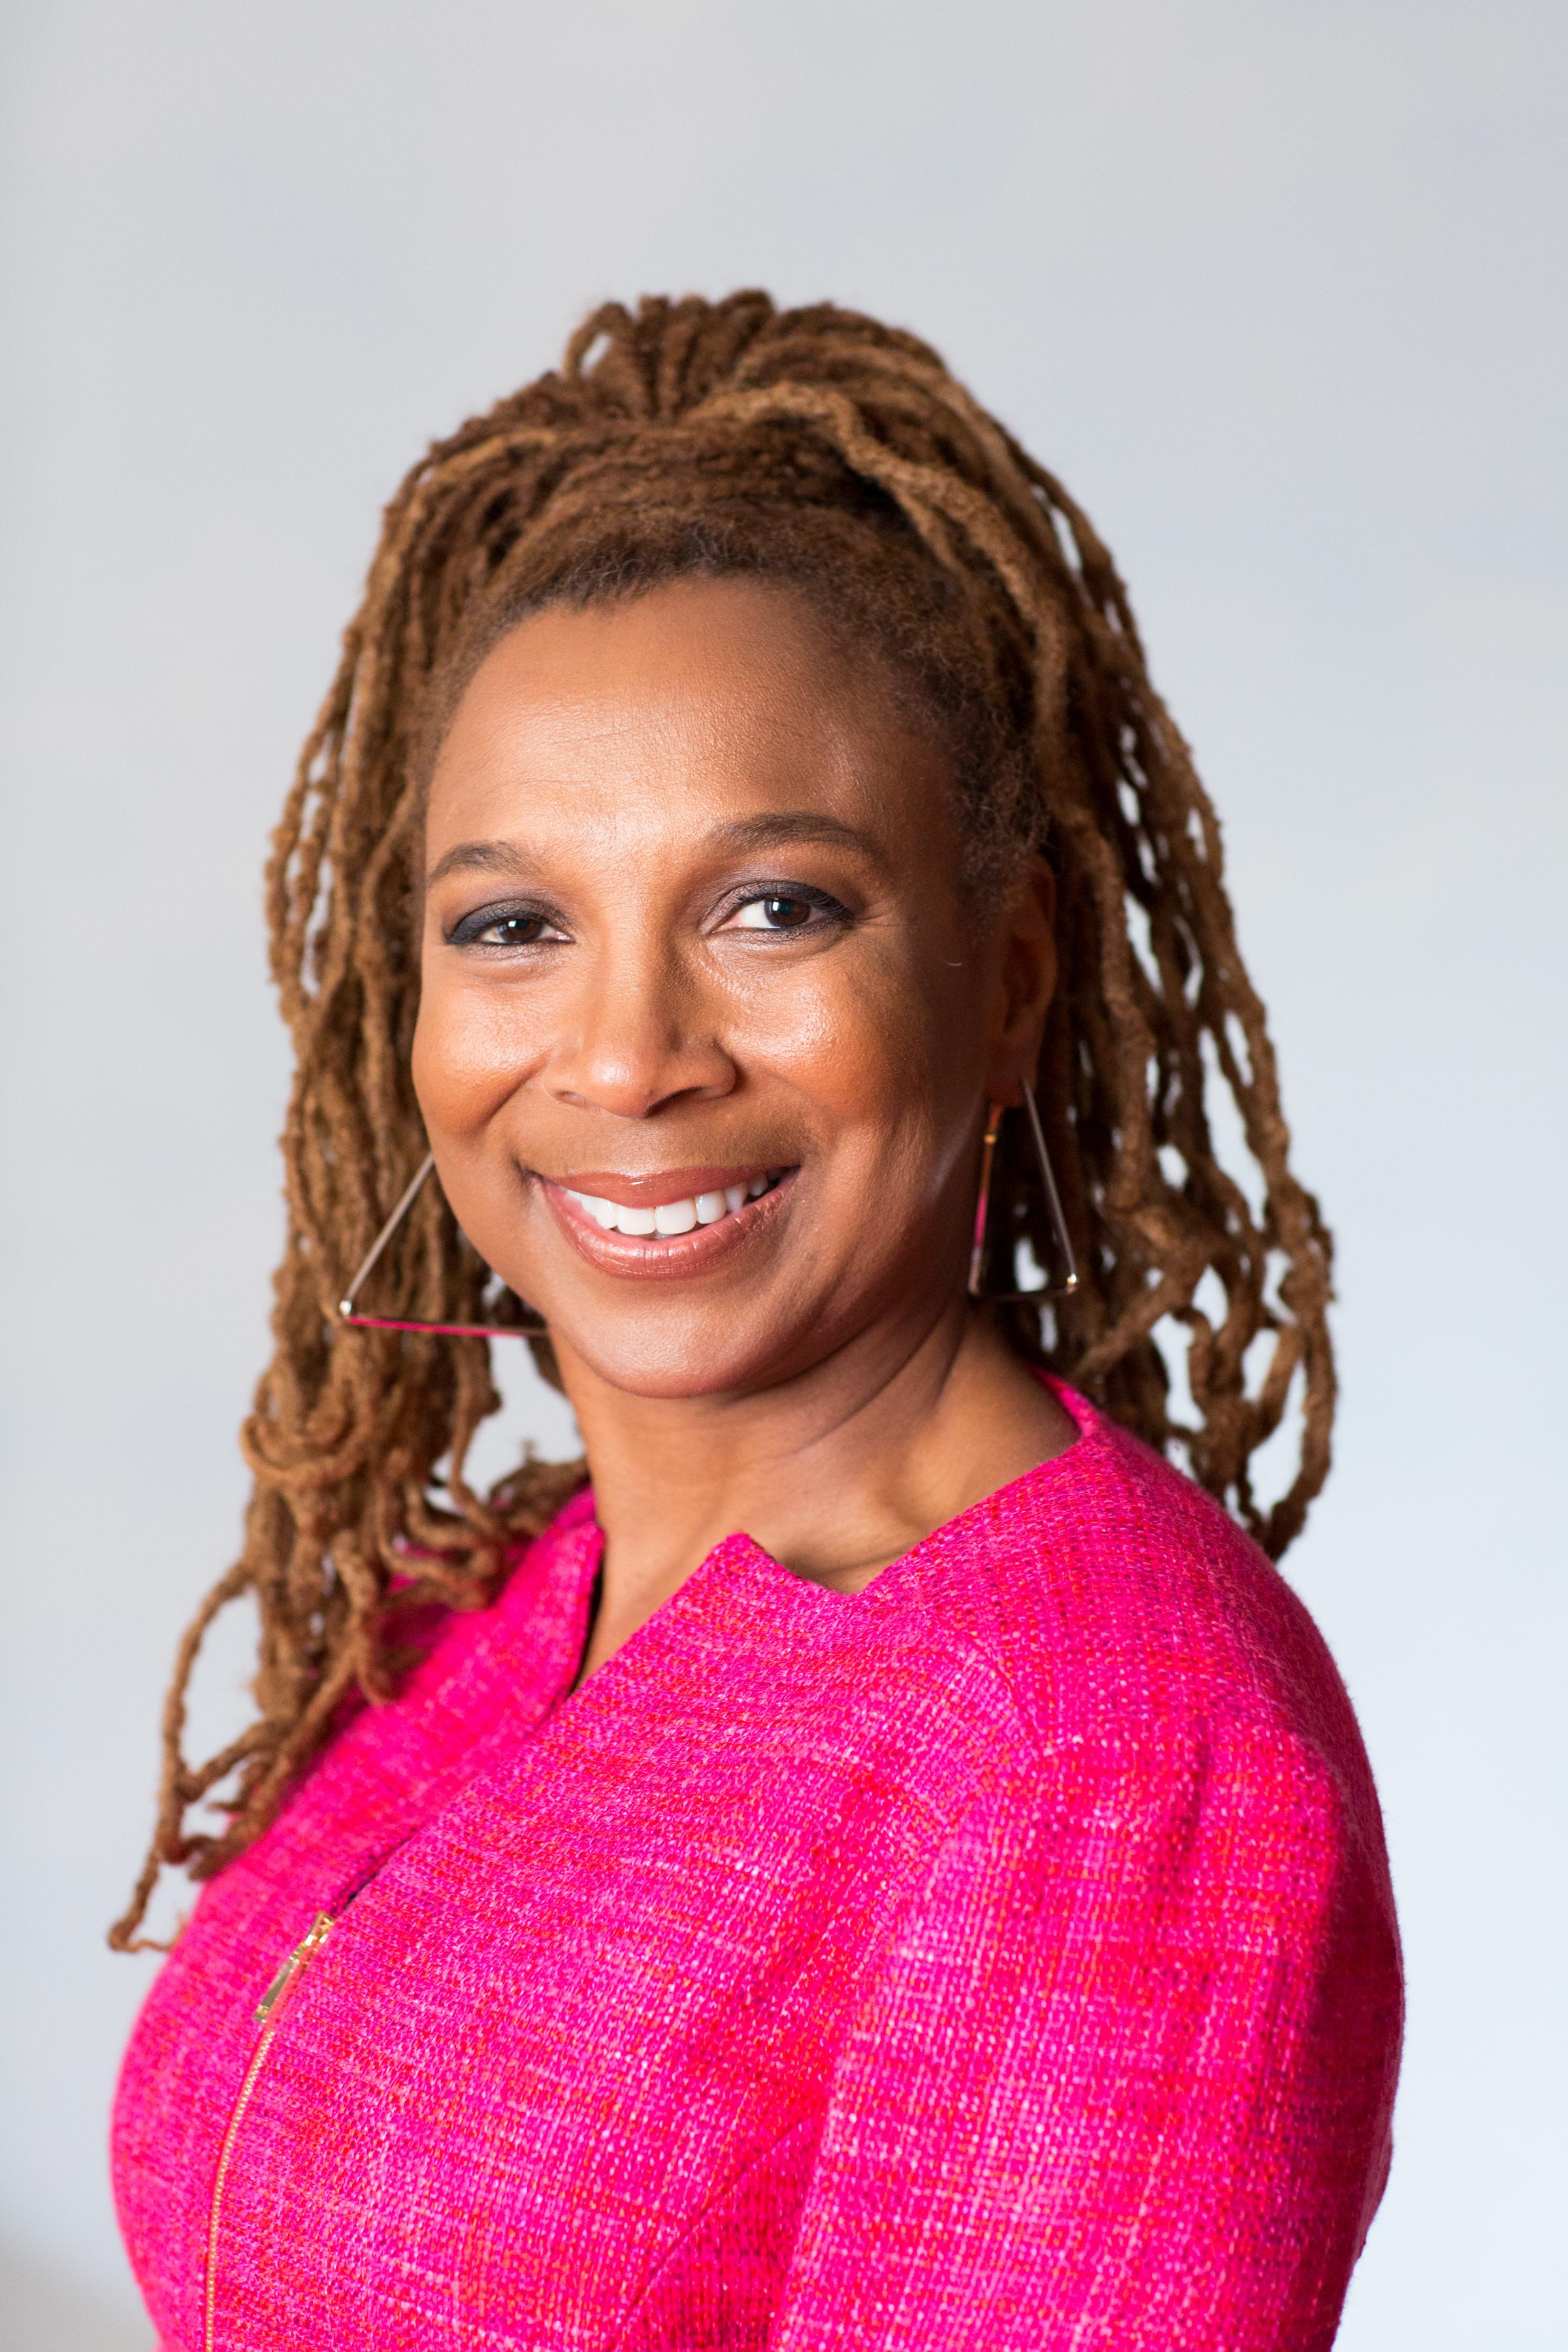 #SayHerName: A Q&A with Professor Kimberlé Crenshaw